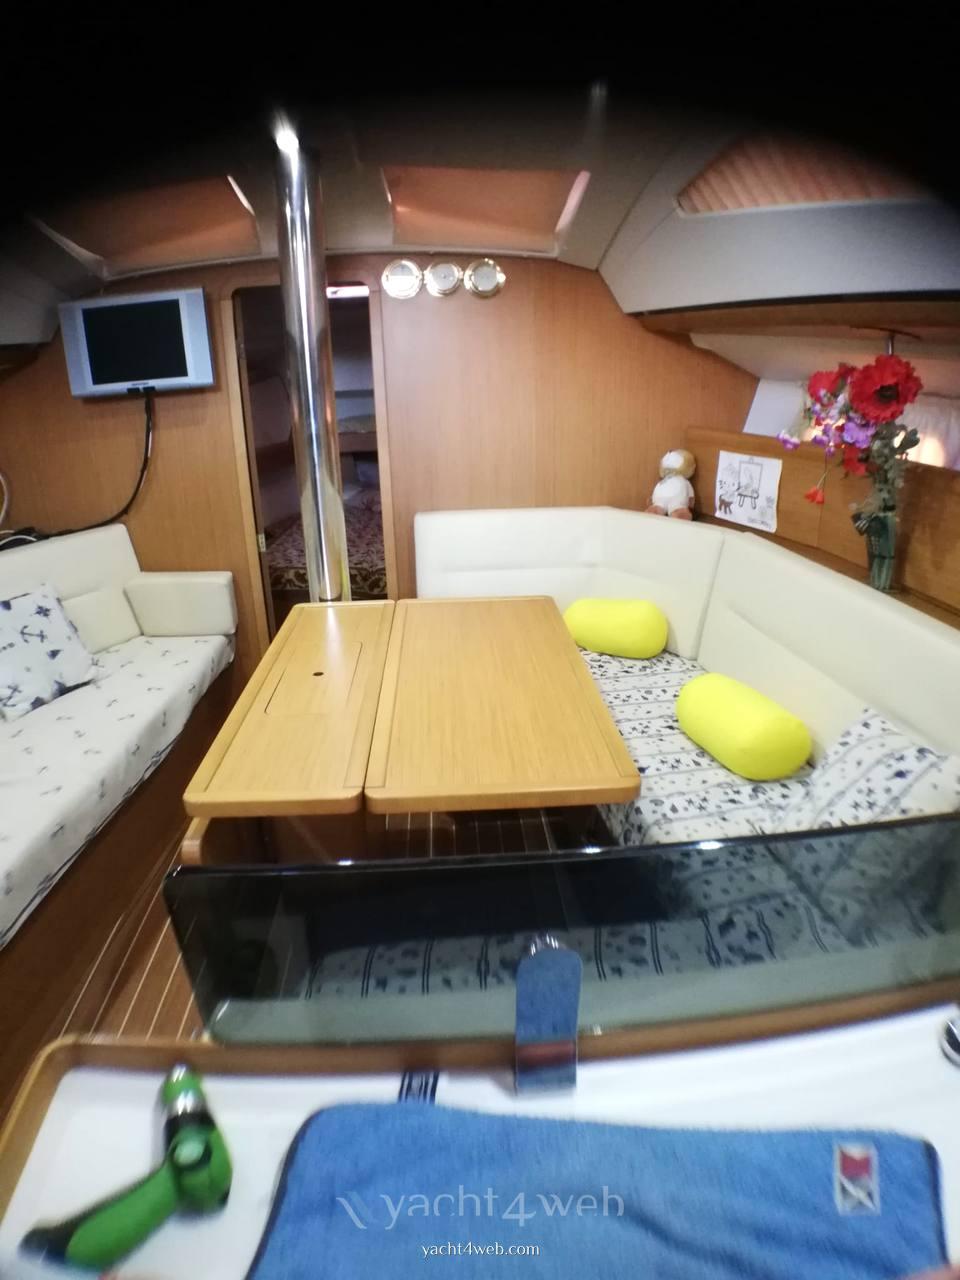 Jeanneau Sun odyssey 39 ds 帆船 用于销售